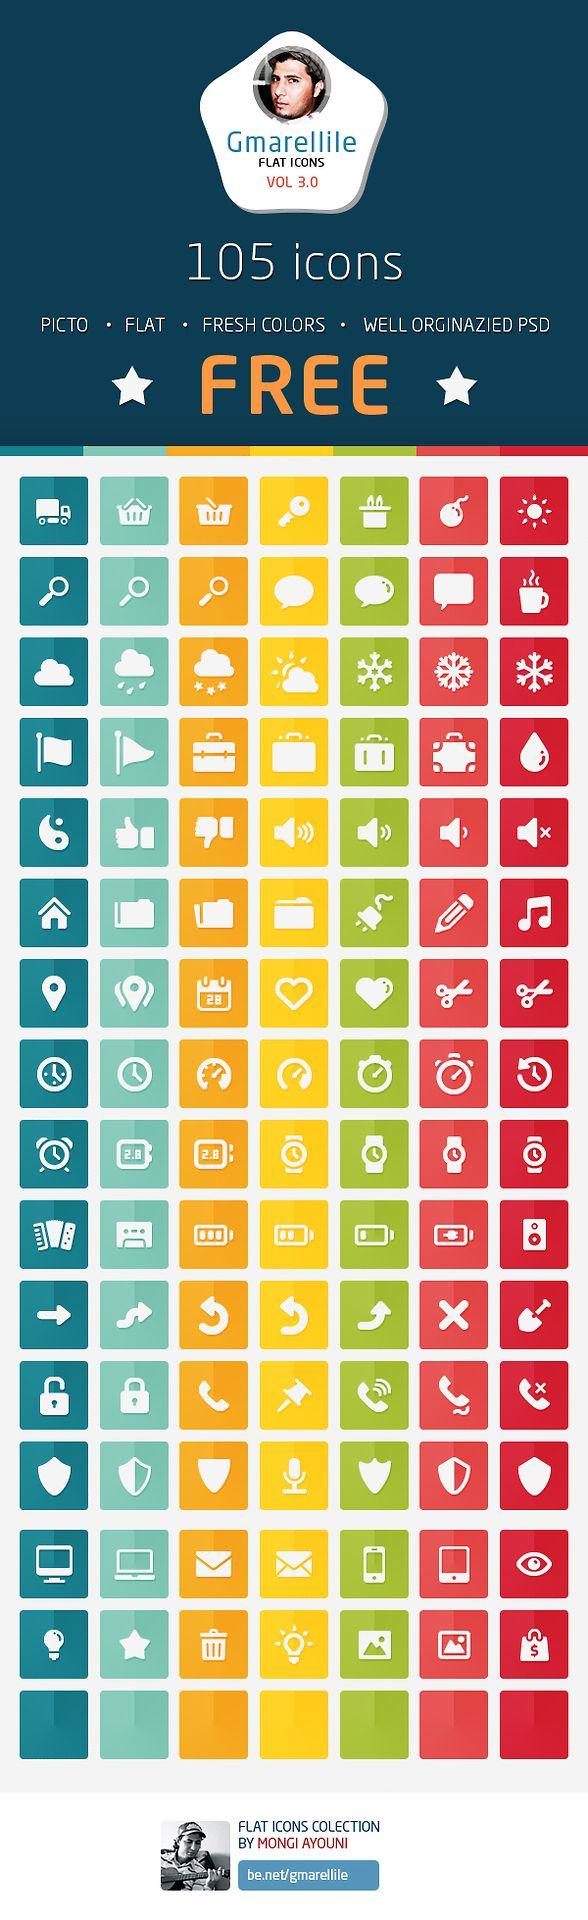 Gmarellile - 105 Free Flat Icons